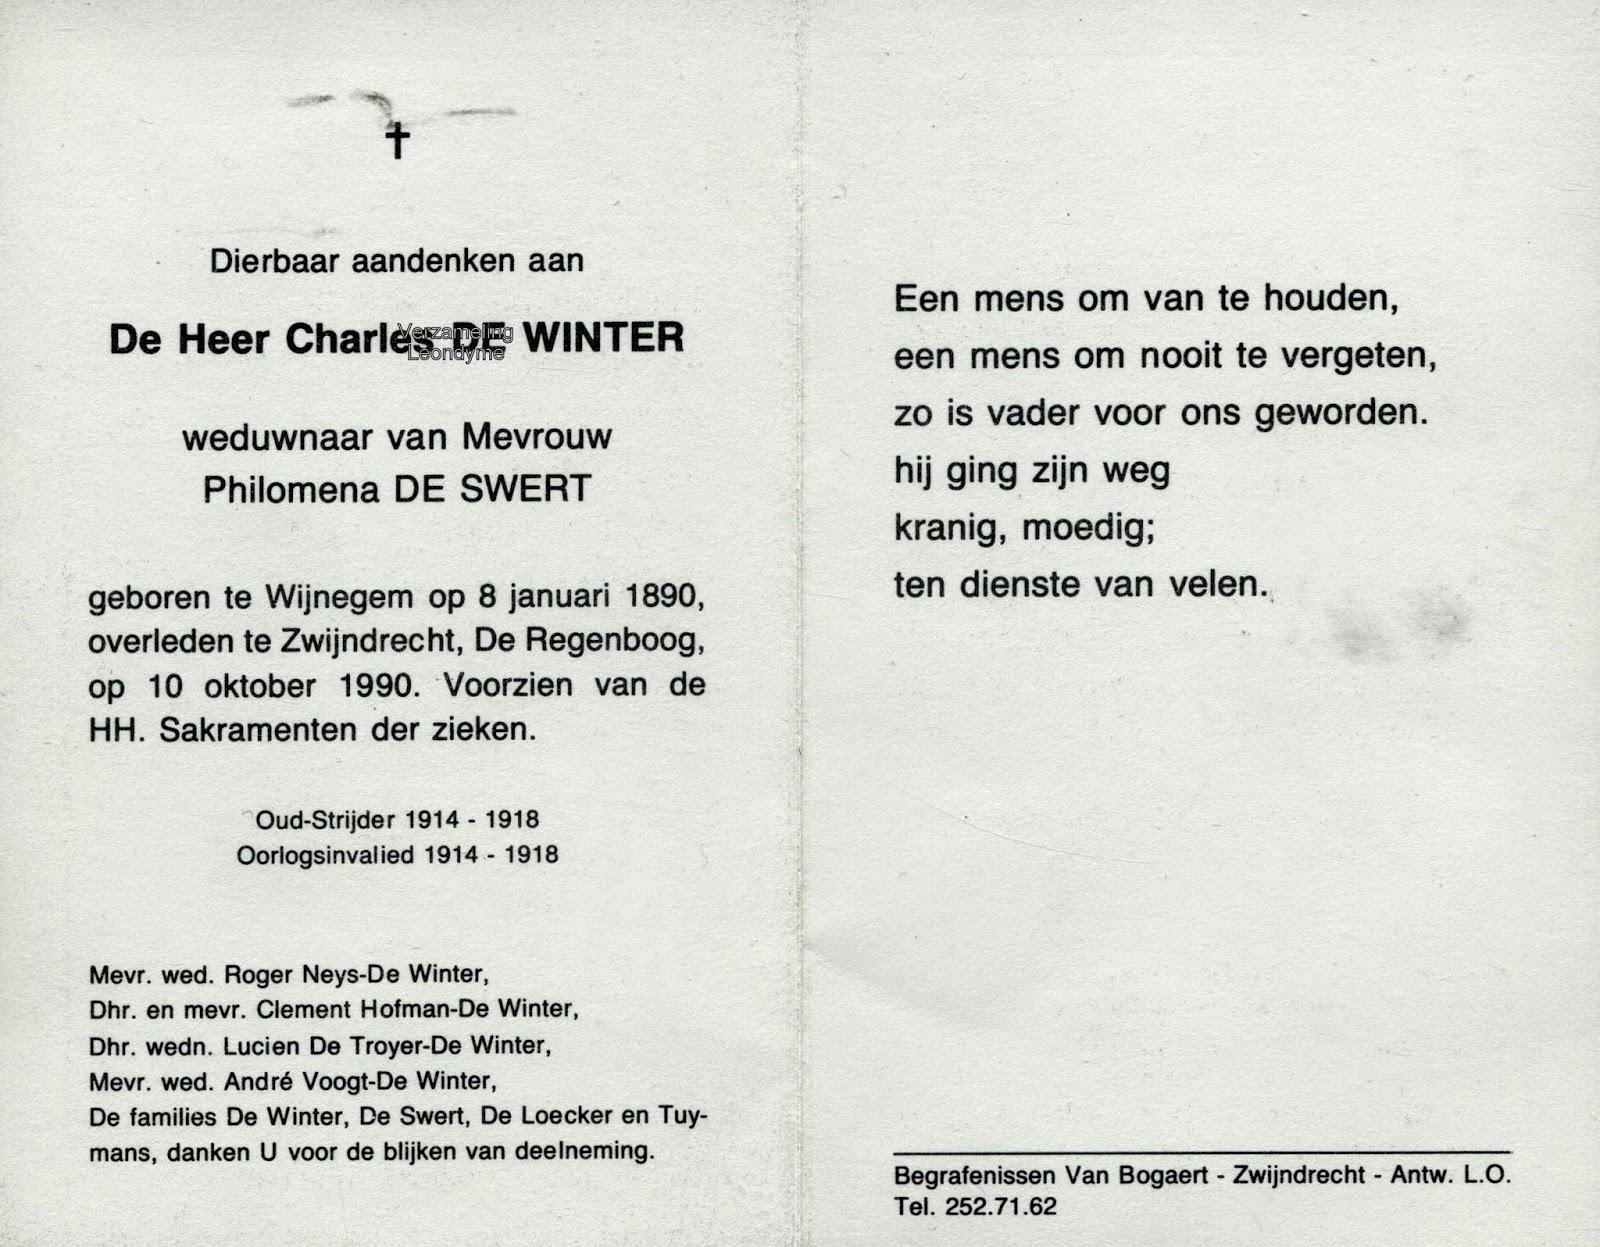 Bidprentje, oud-strijder Charles De Winter 1890-1990. Verzameling Leondyme.